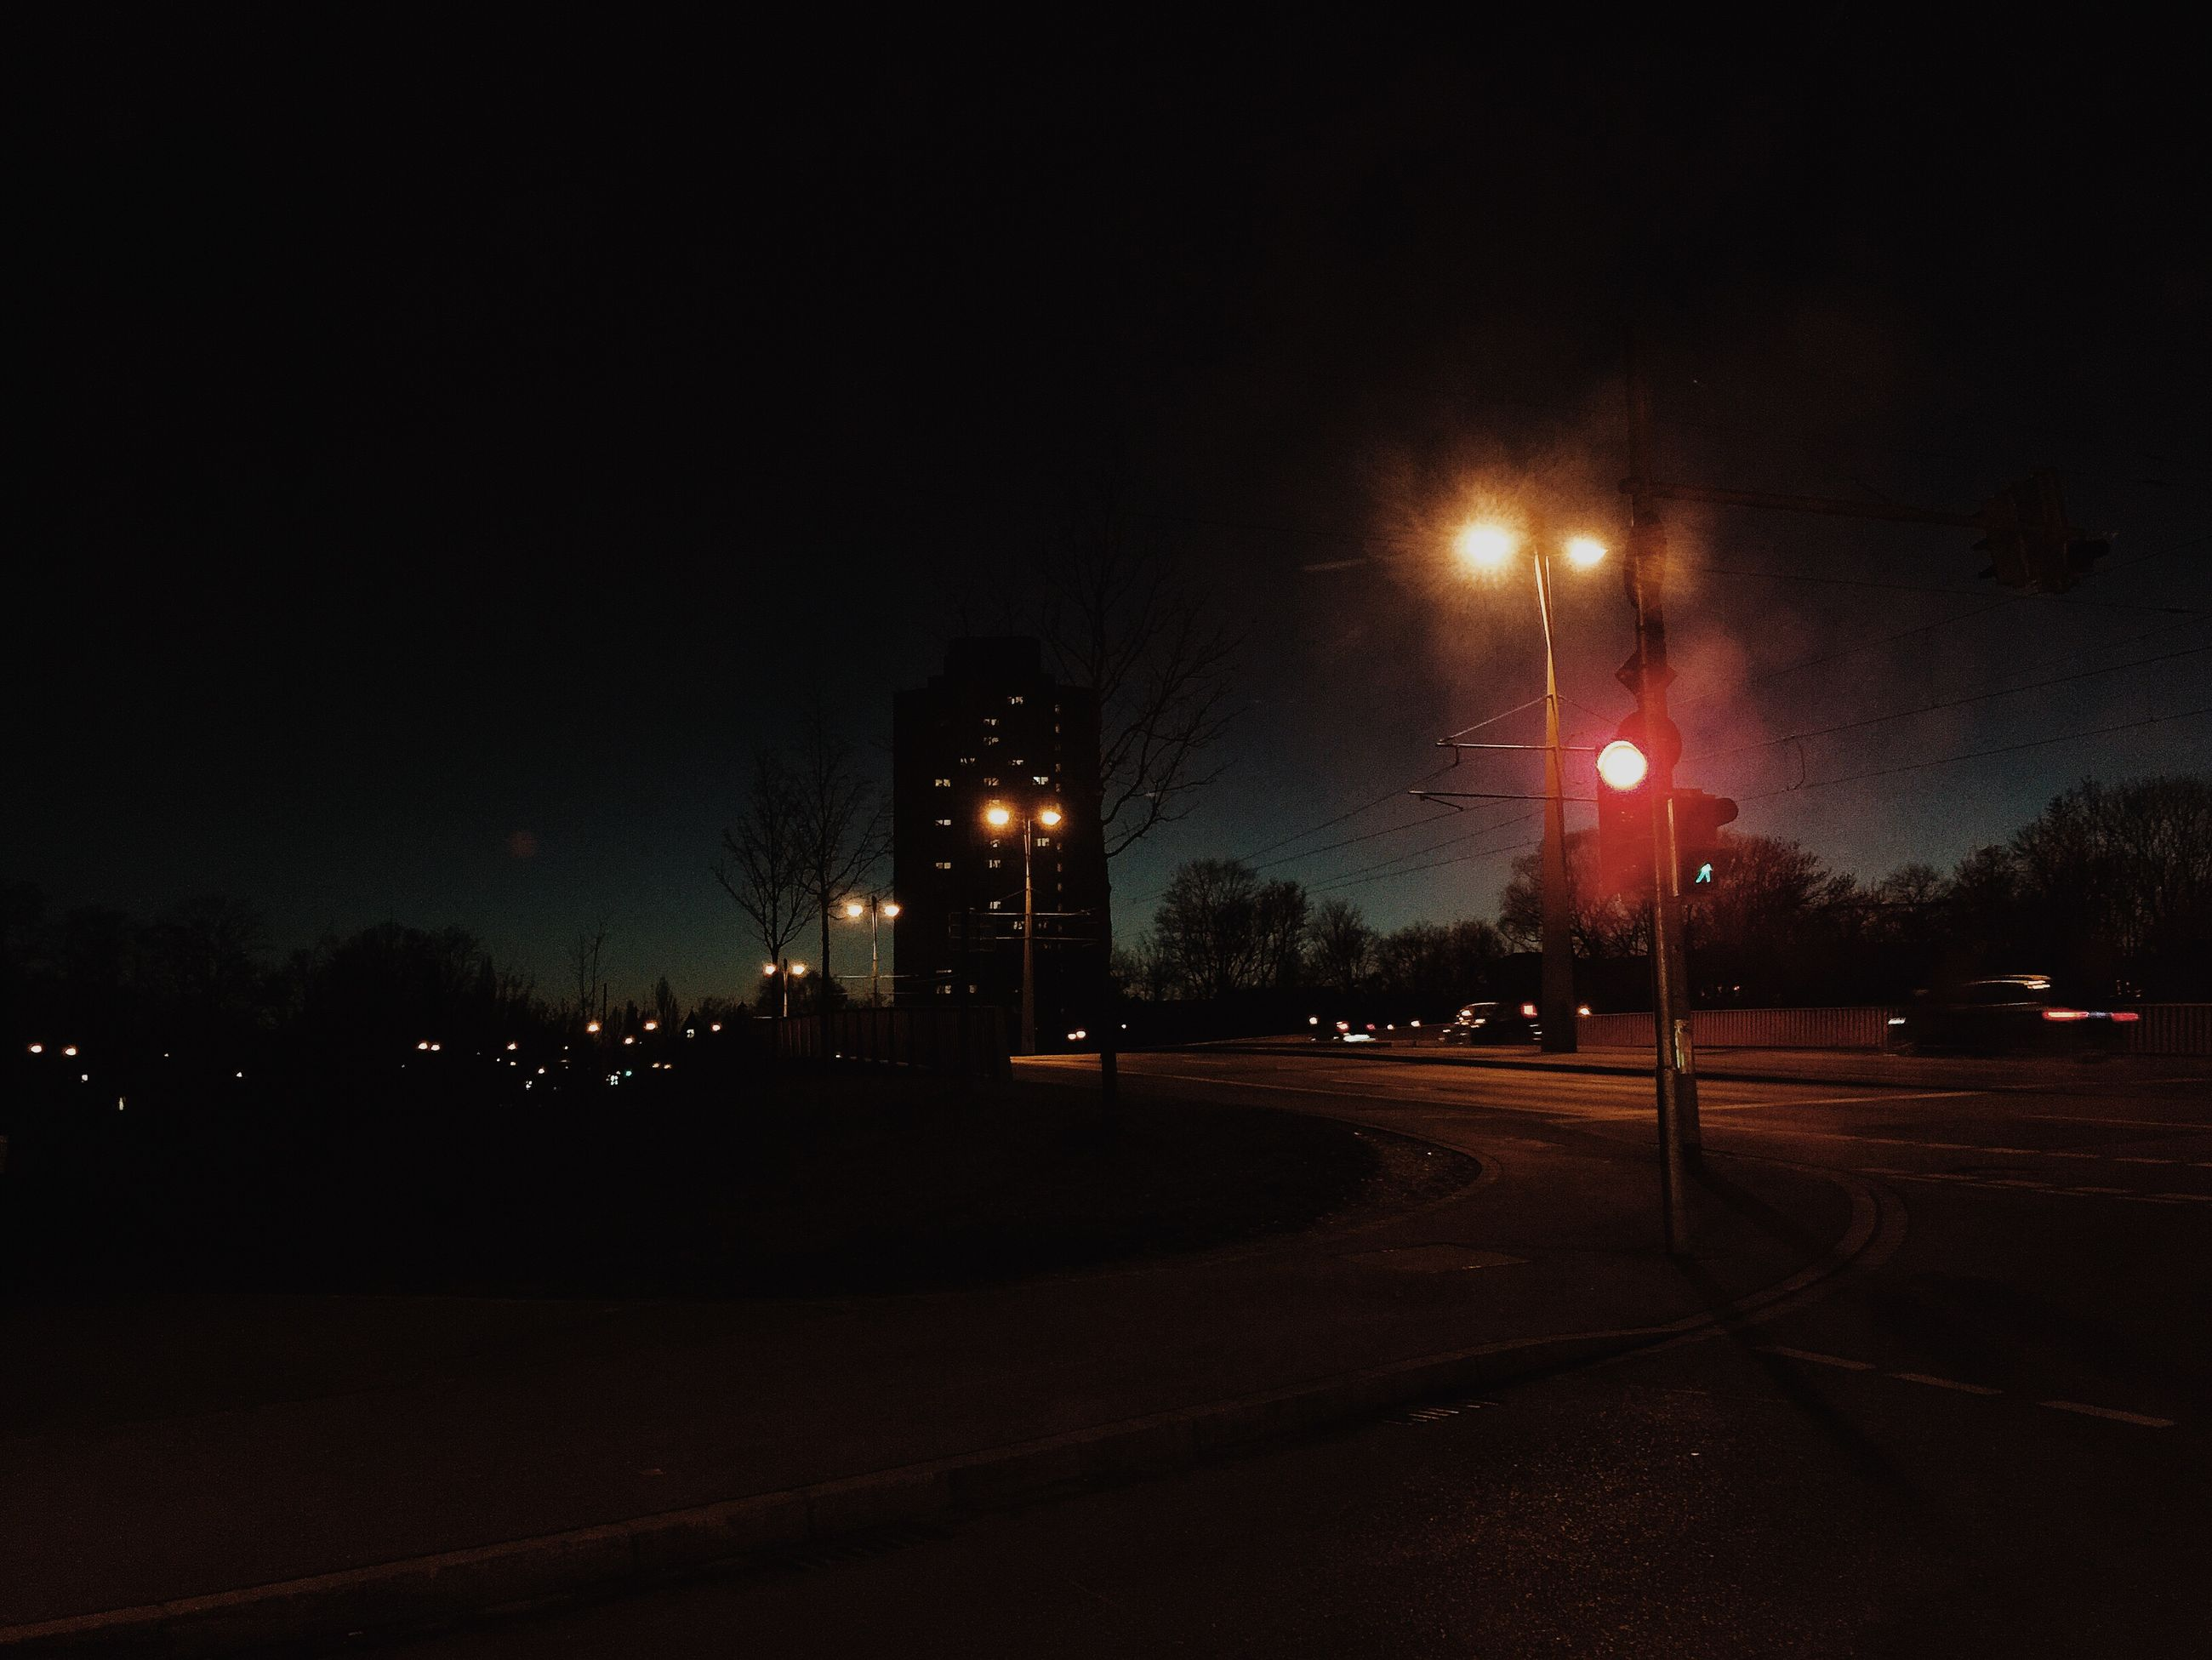 night, illuminated, street light, road, street, transportation, lighting equipment, the way forward, tree, sky, dark, car, copy space, road marking, outdoors, building exterior, city, clear sky, no people, empty